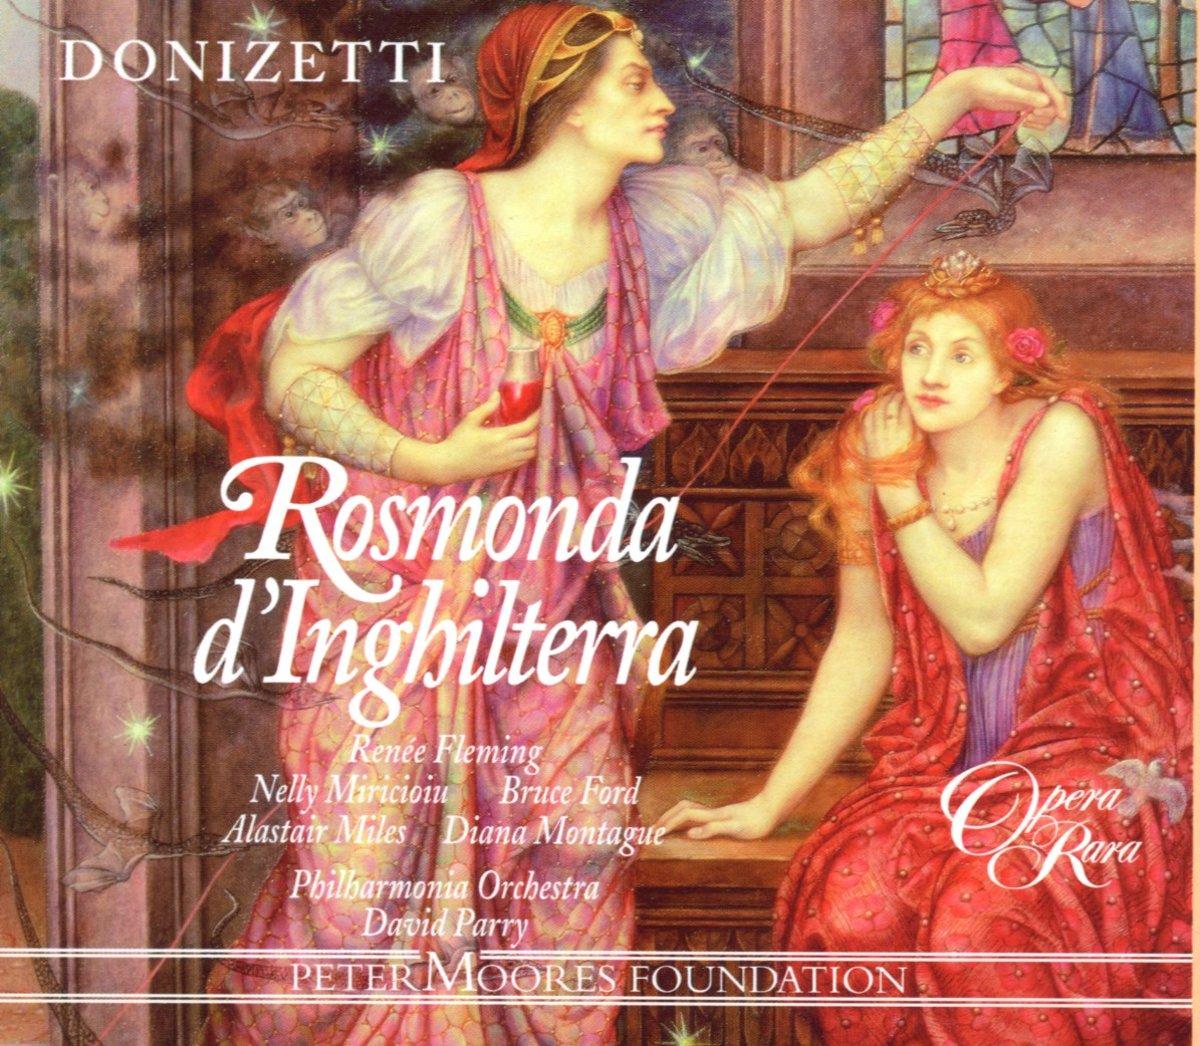 Opera Rara Rosmonda